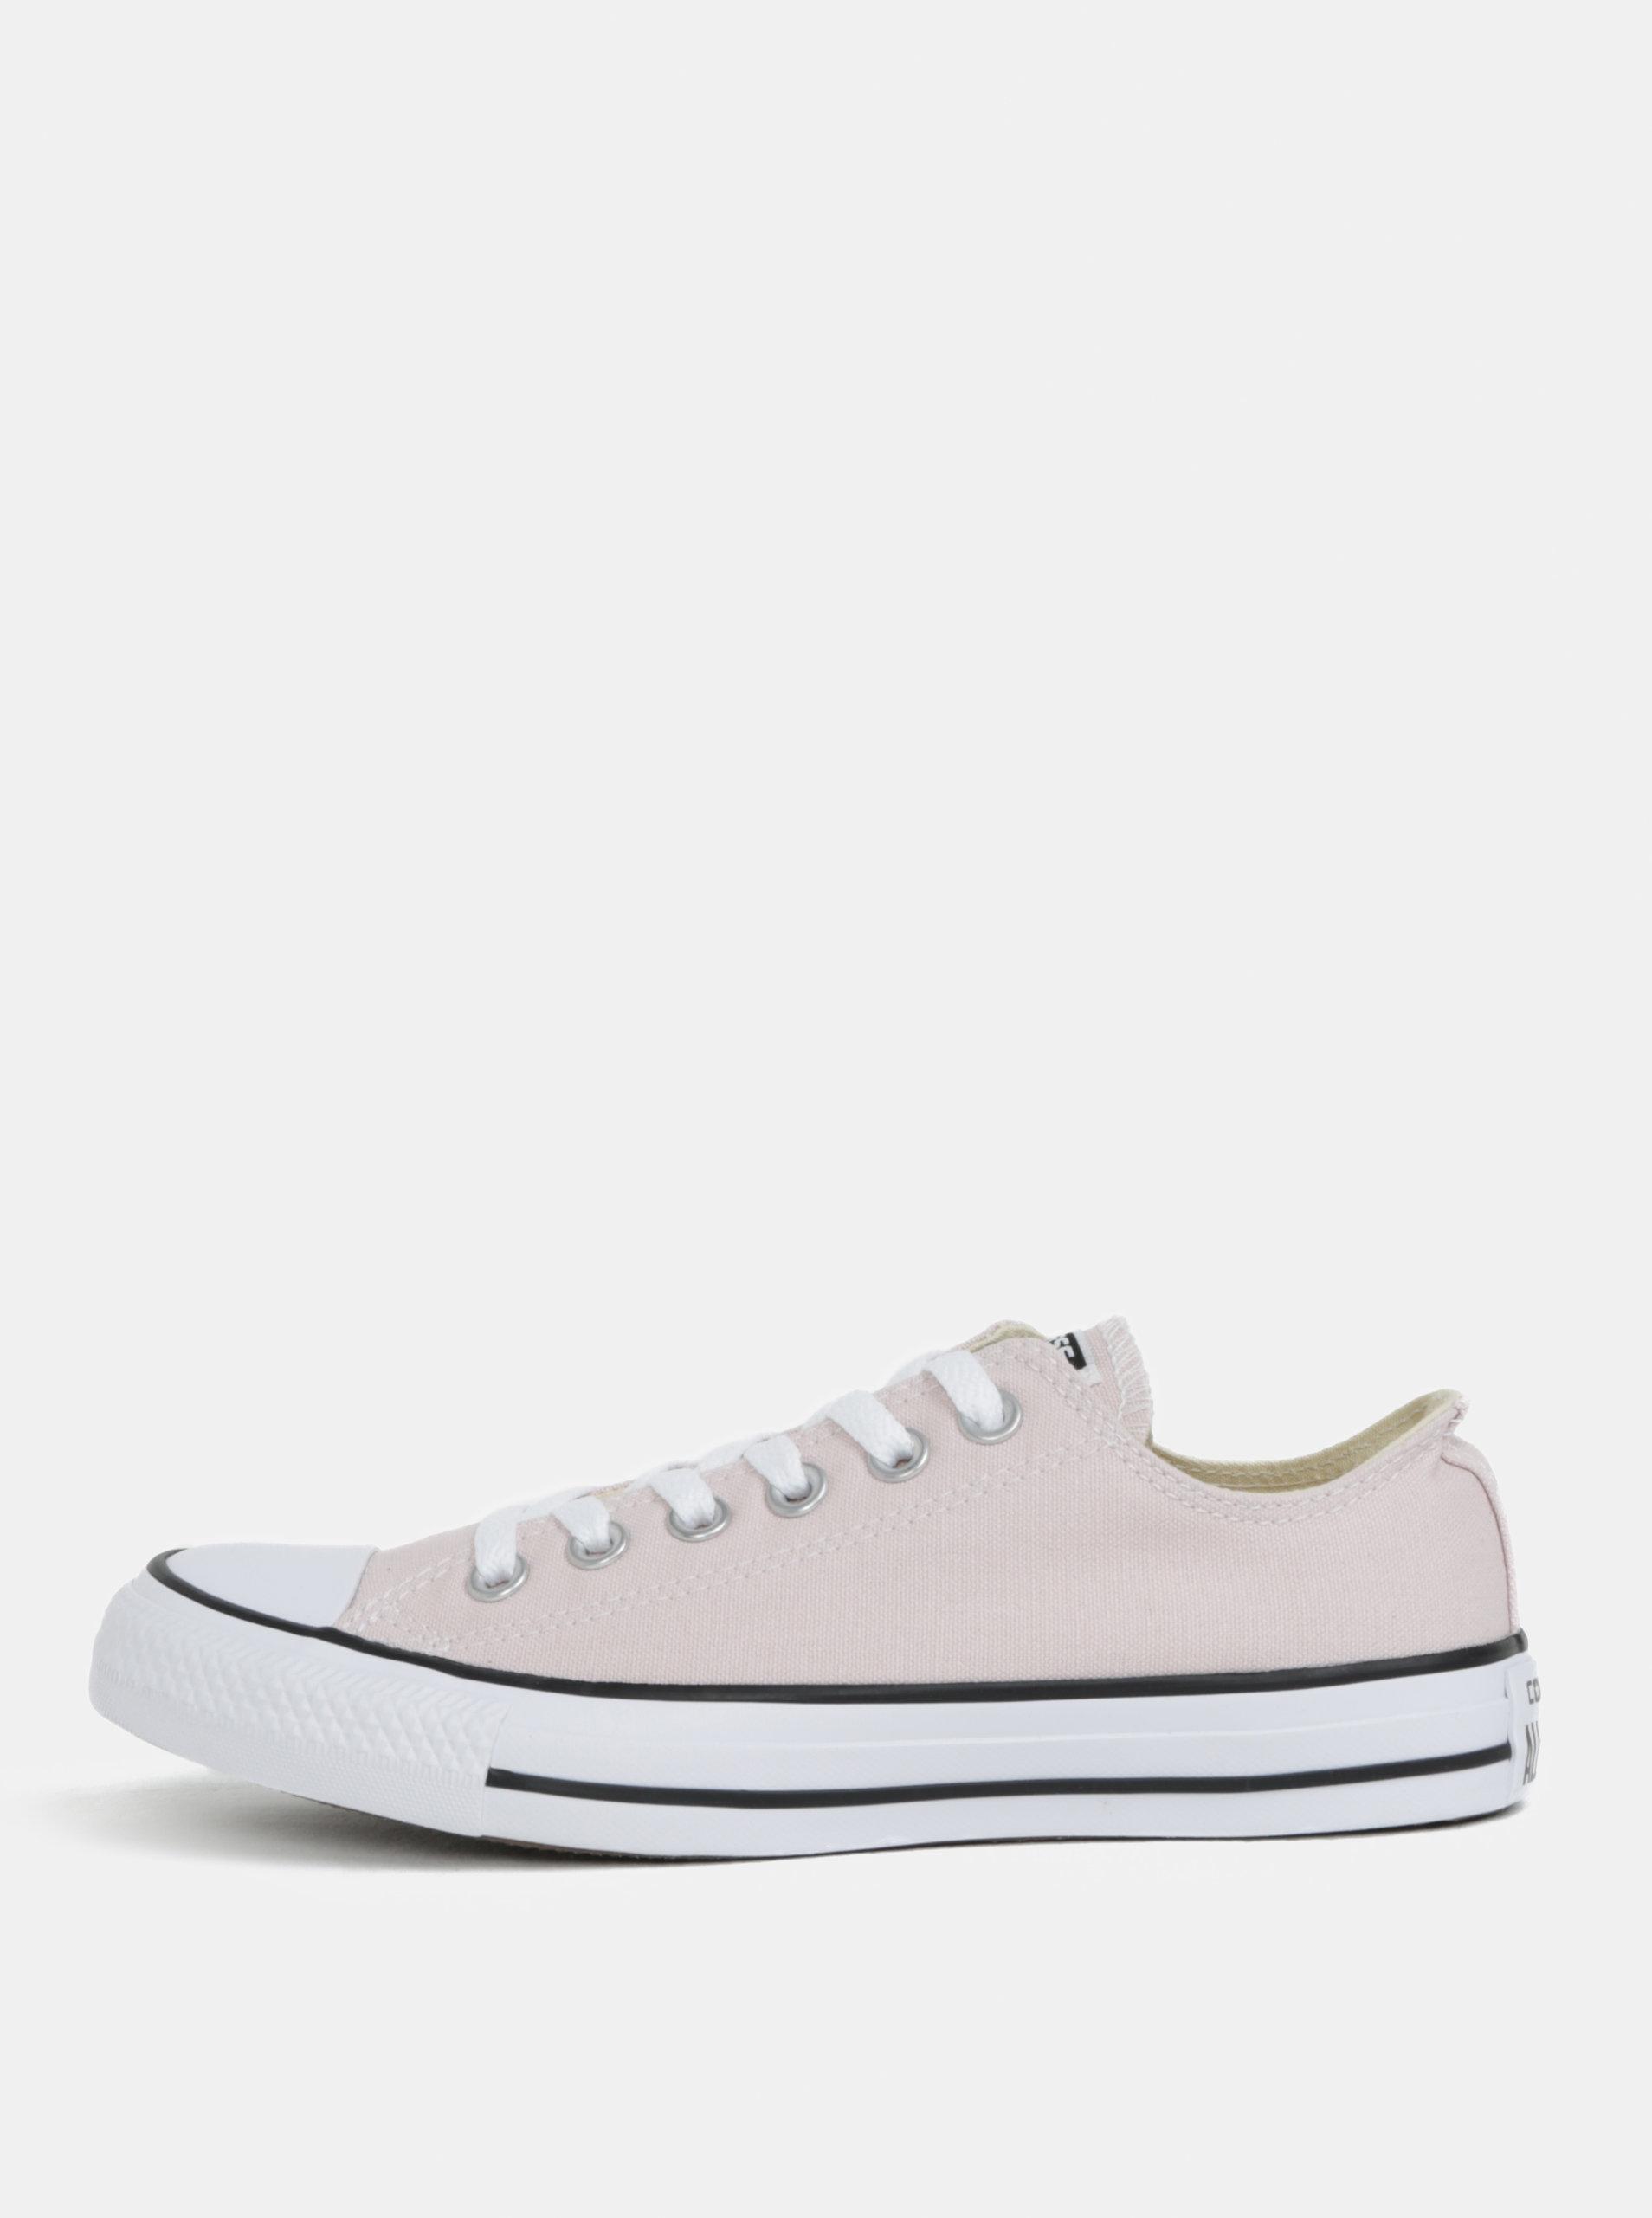 3b020d2abc4f3 Světle růžové dámské tenisky Converse Chuck Taylor All Star | ZOOT.cz